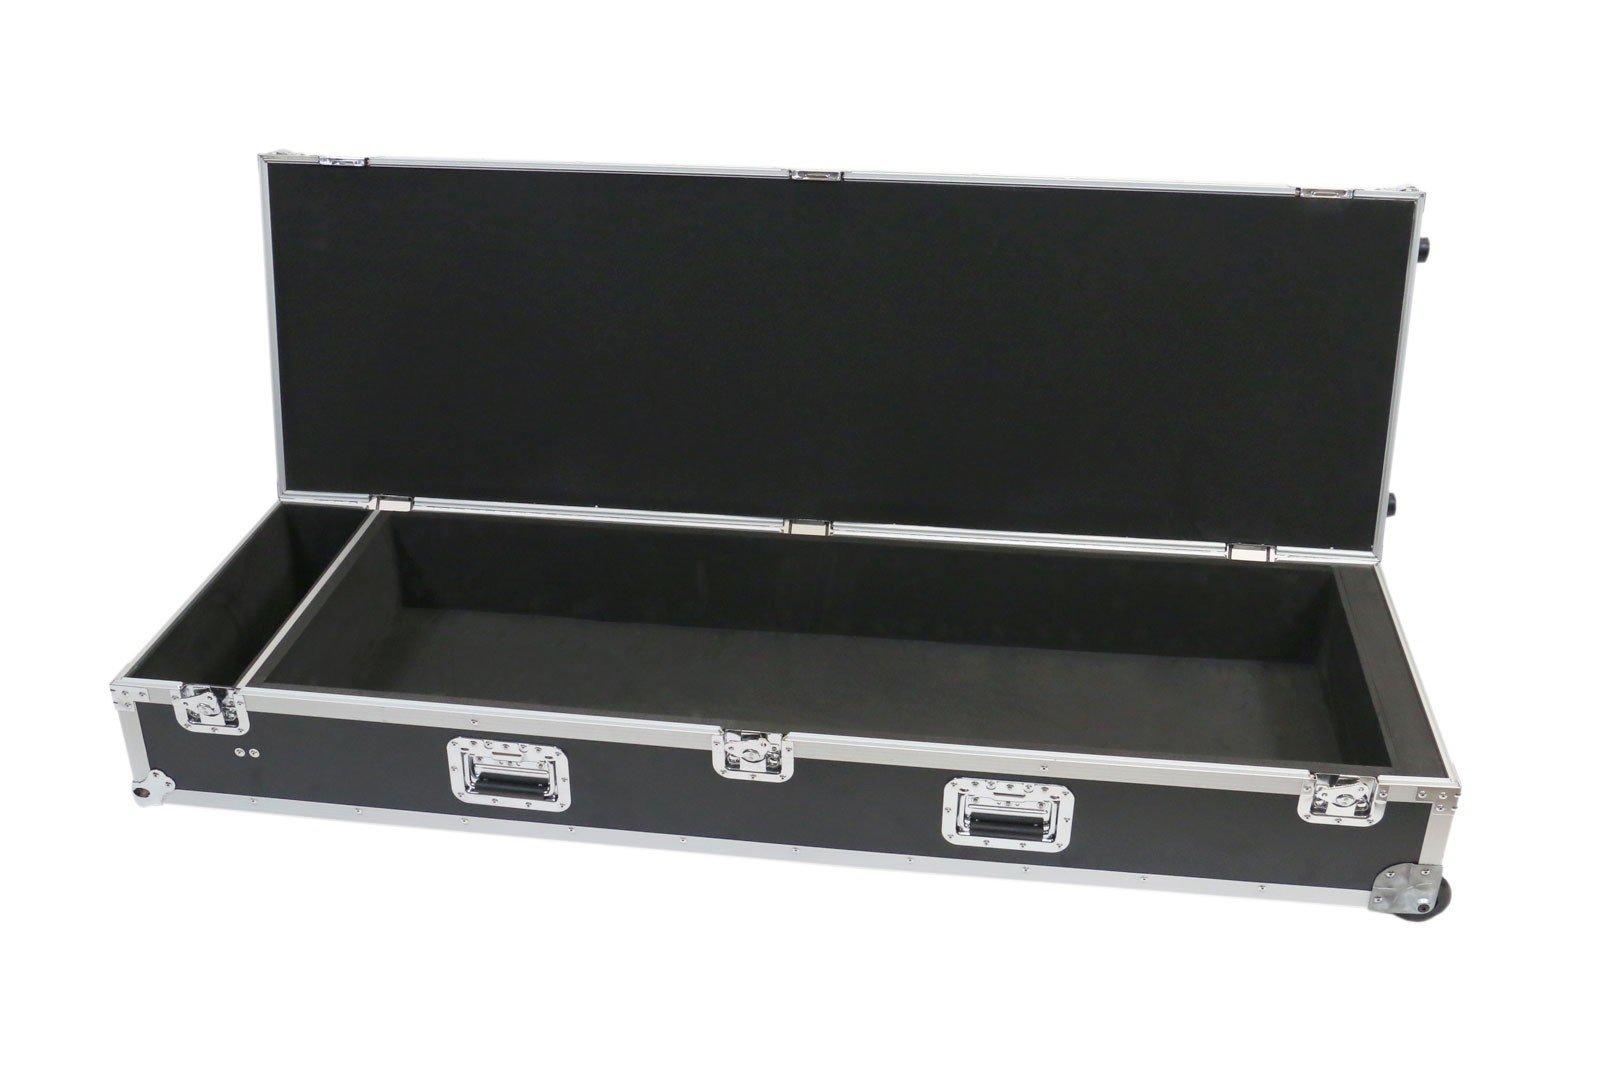 OSP Cases | ATA Road Case | Keyboard Case for Yamaha Motif XF8, ES8, XS8 | ATA-XF8-WC